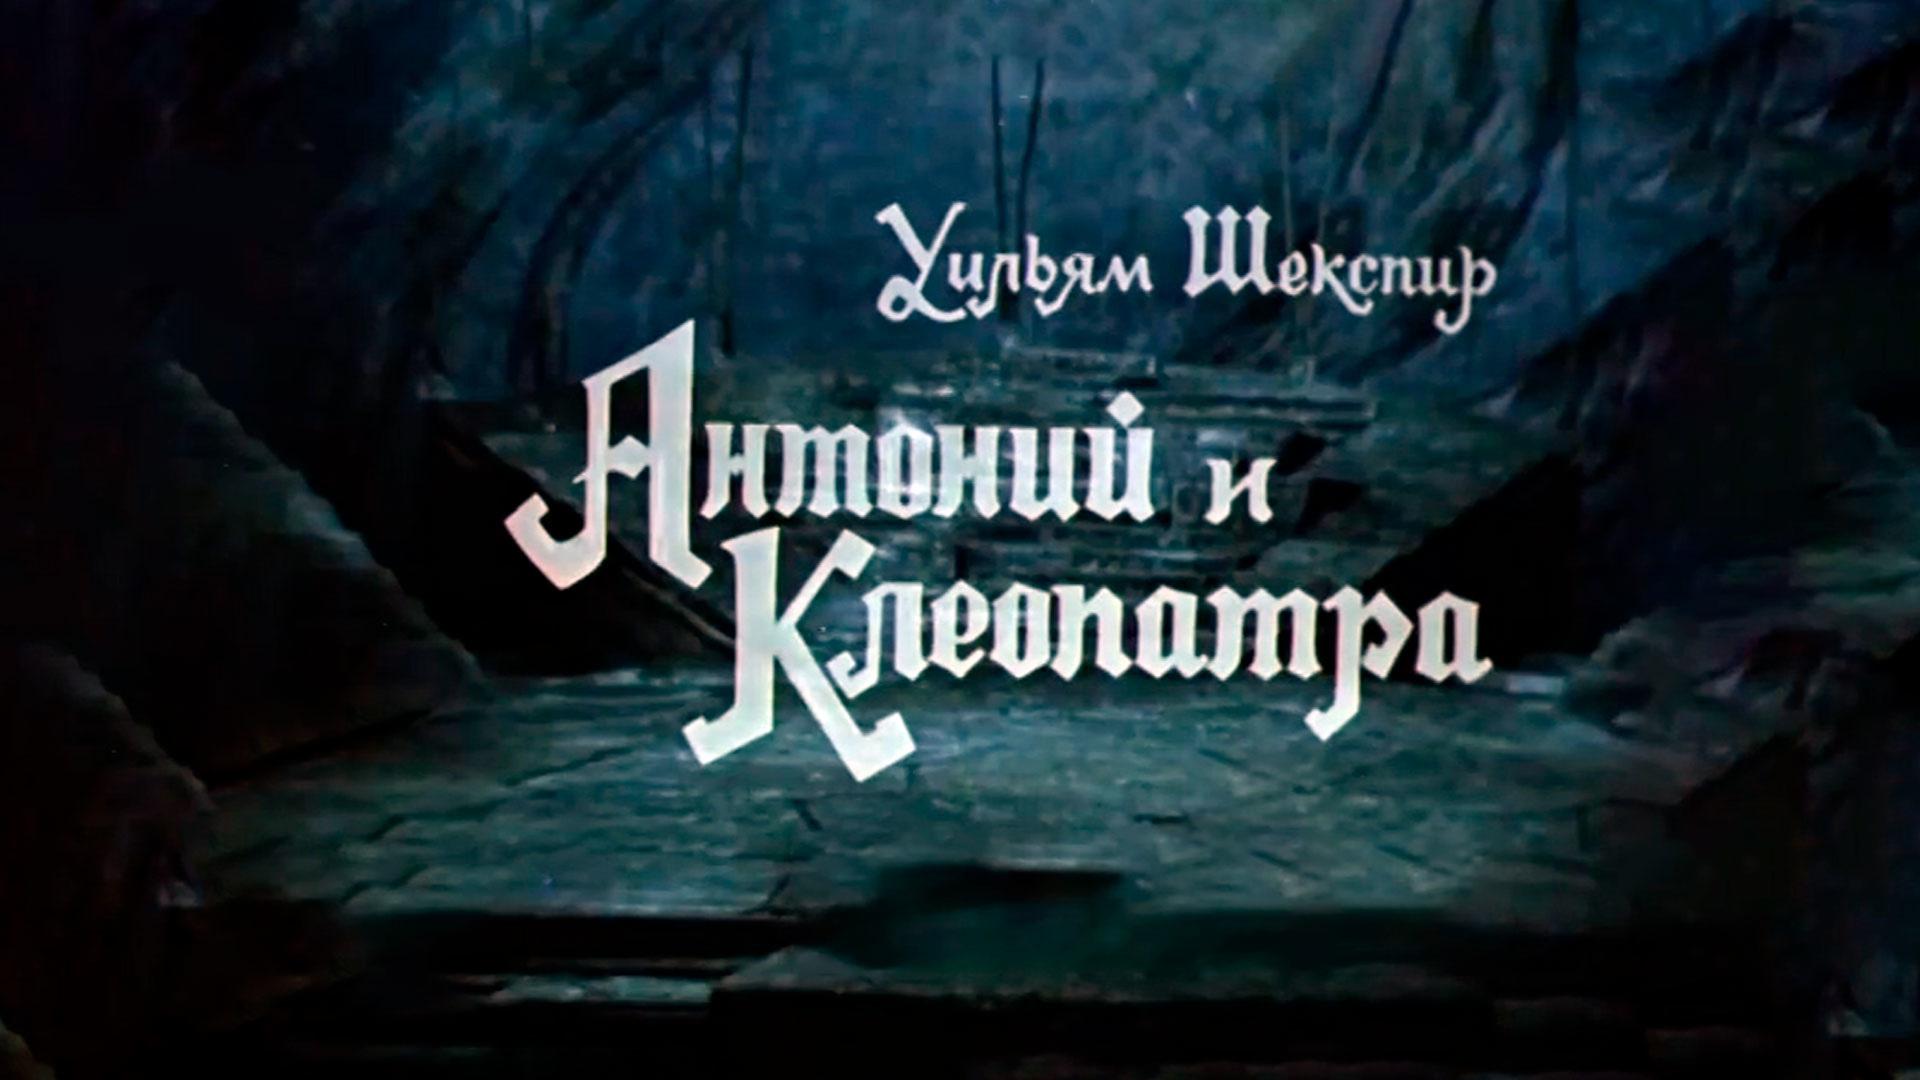 Антоний и Клеопатра (Театр им. Евг. Вахтангова)